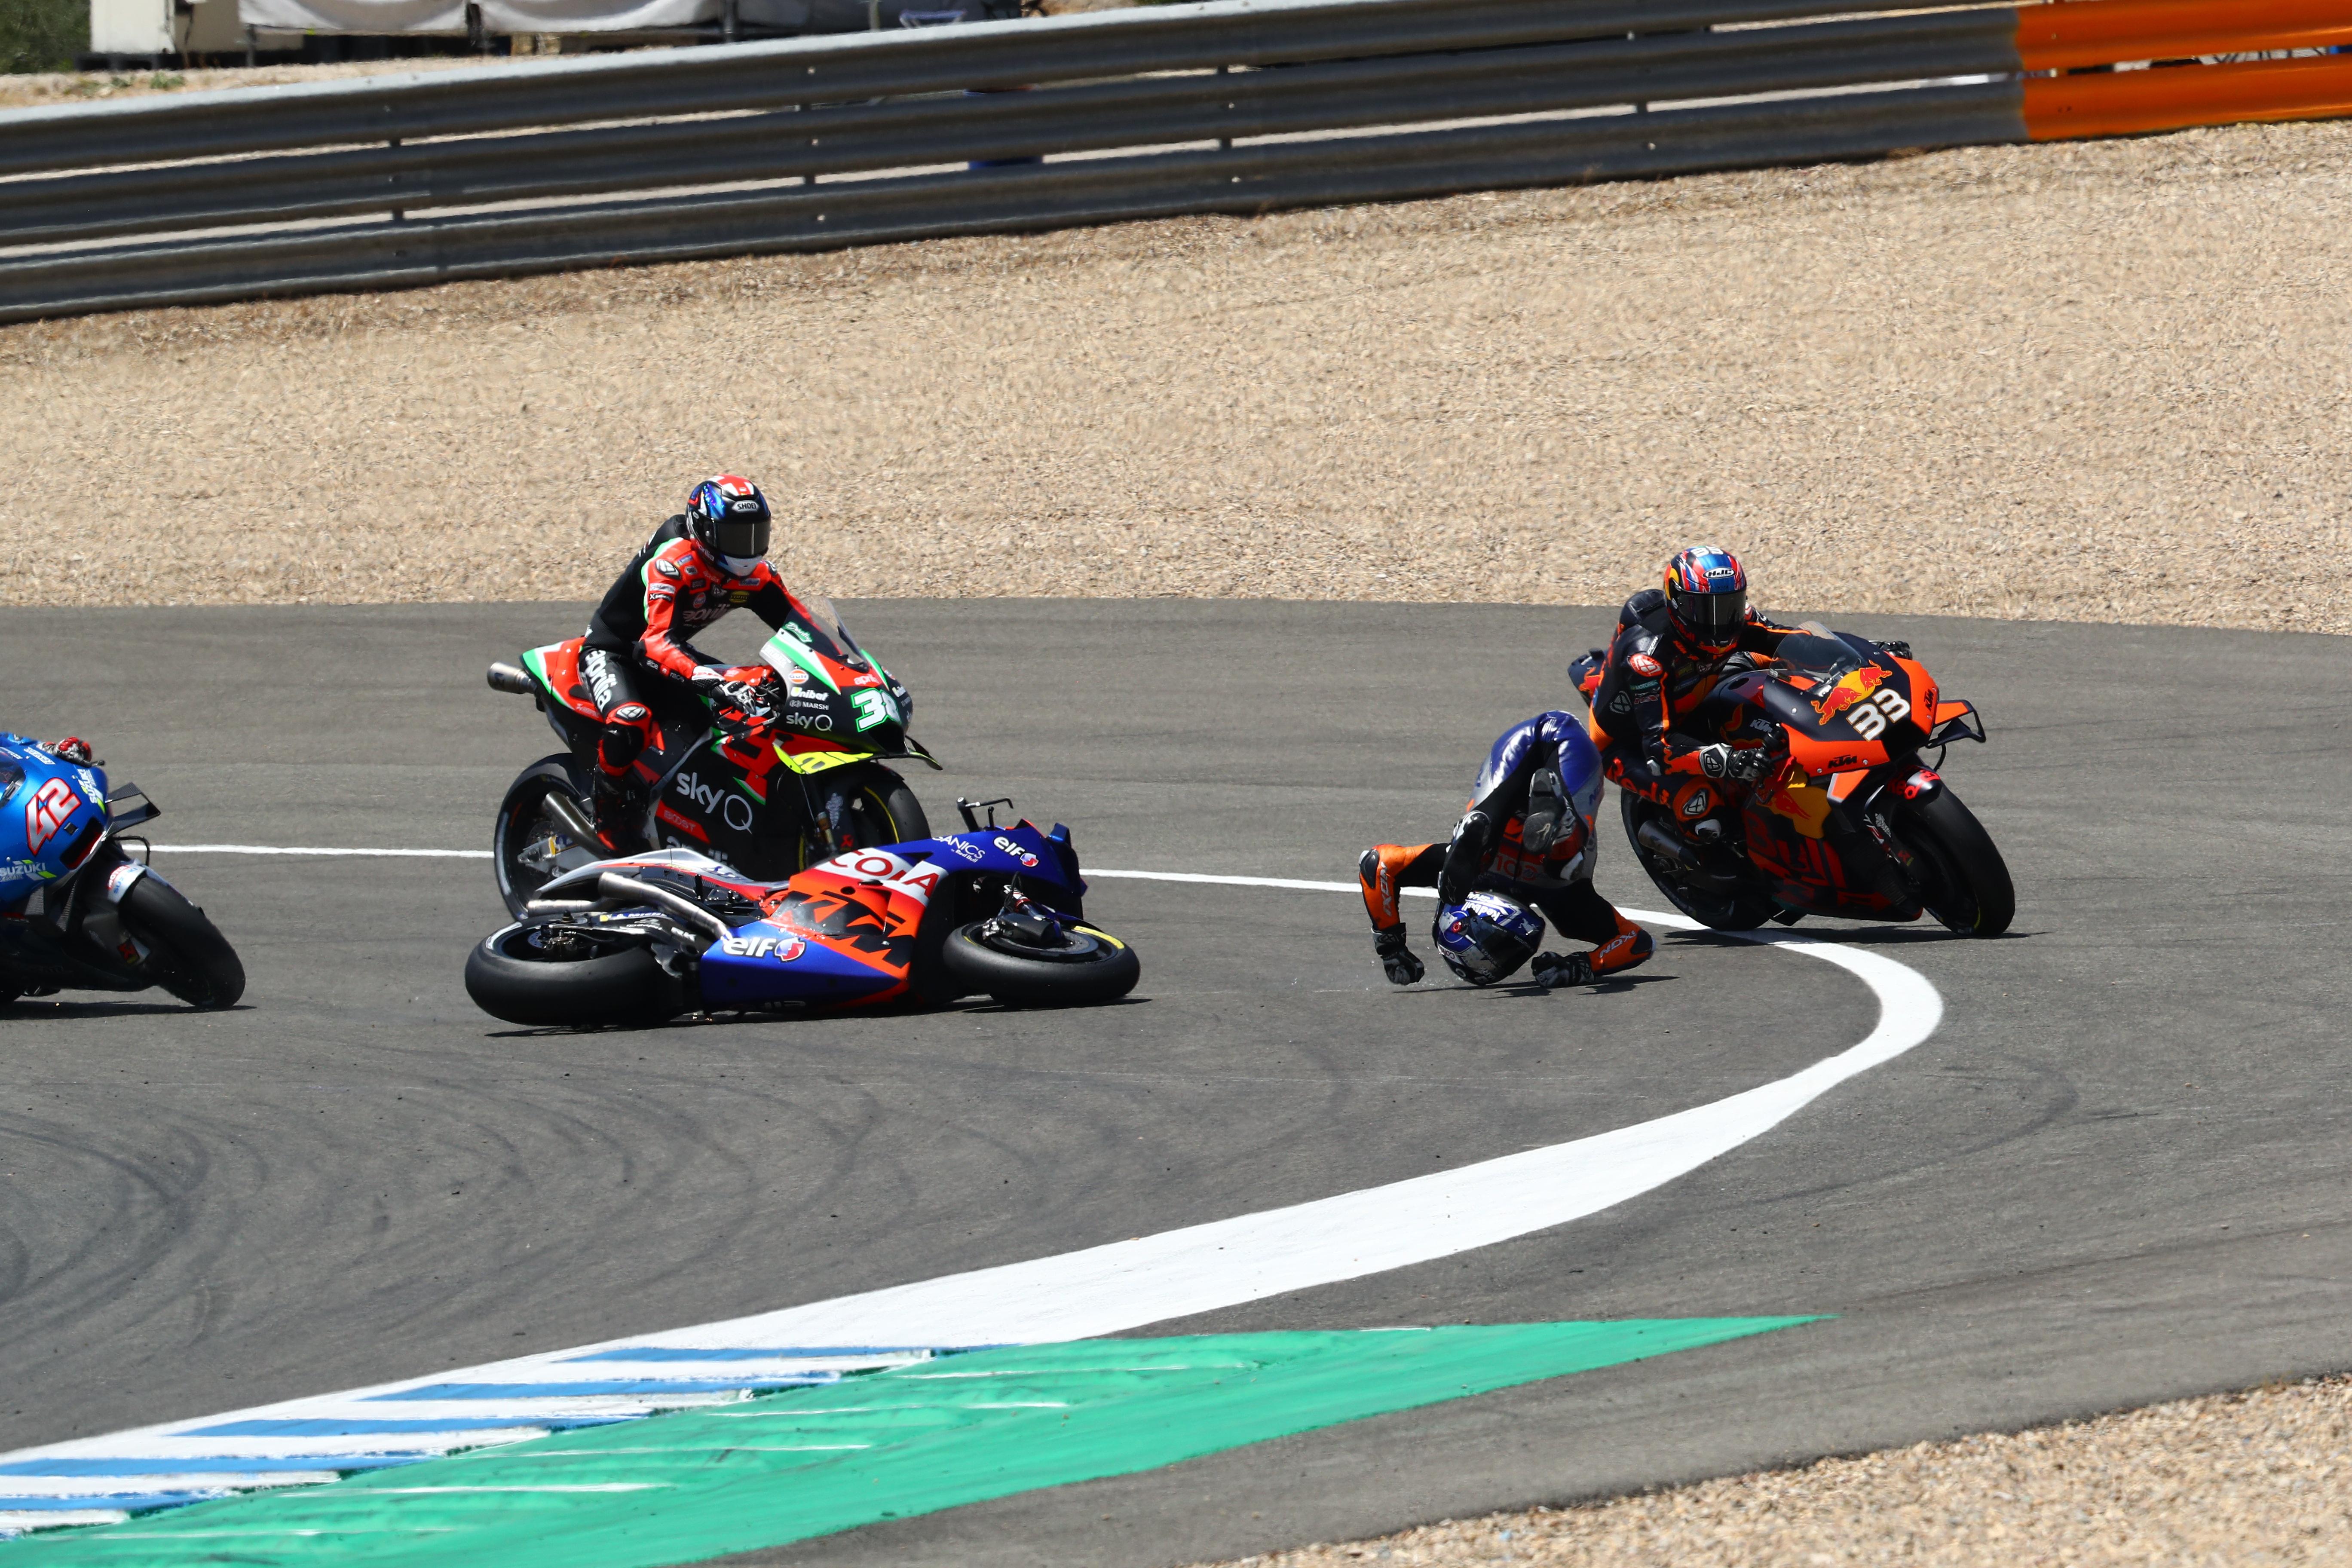 Brad Binder Miguel Oliveira crash Jerez MotoGP 2020